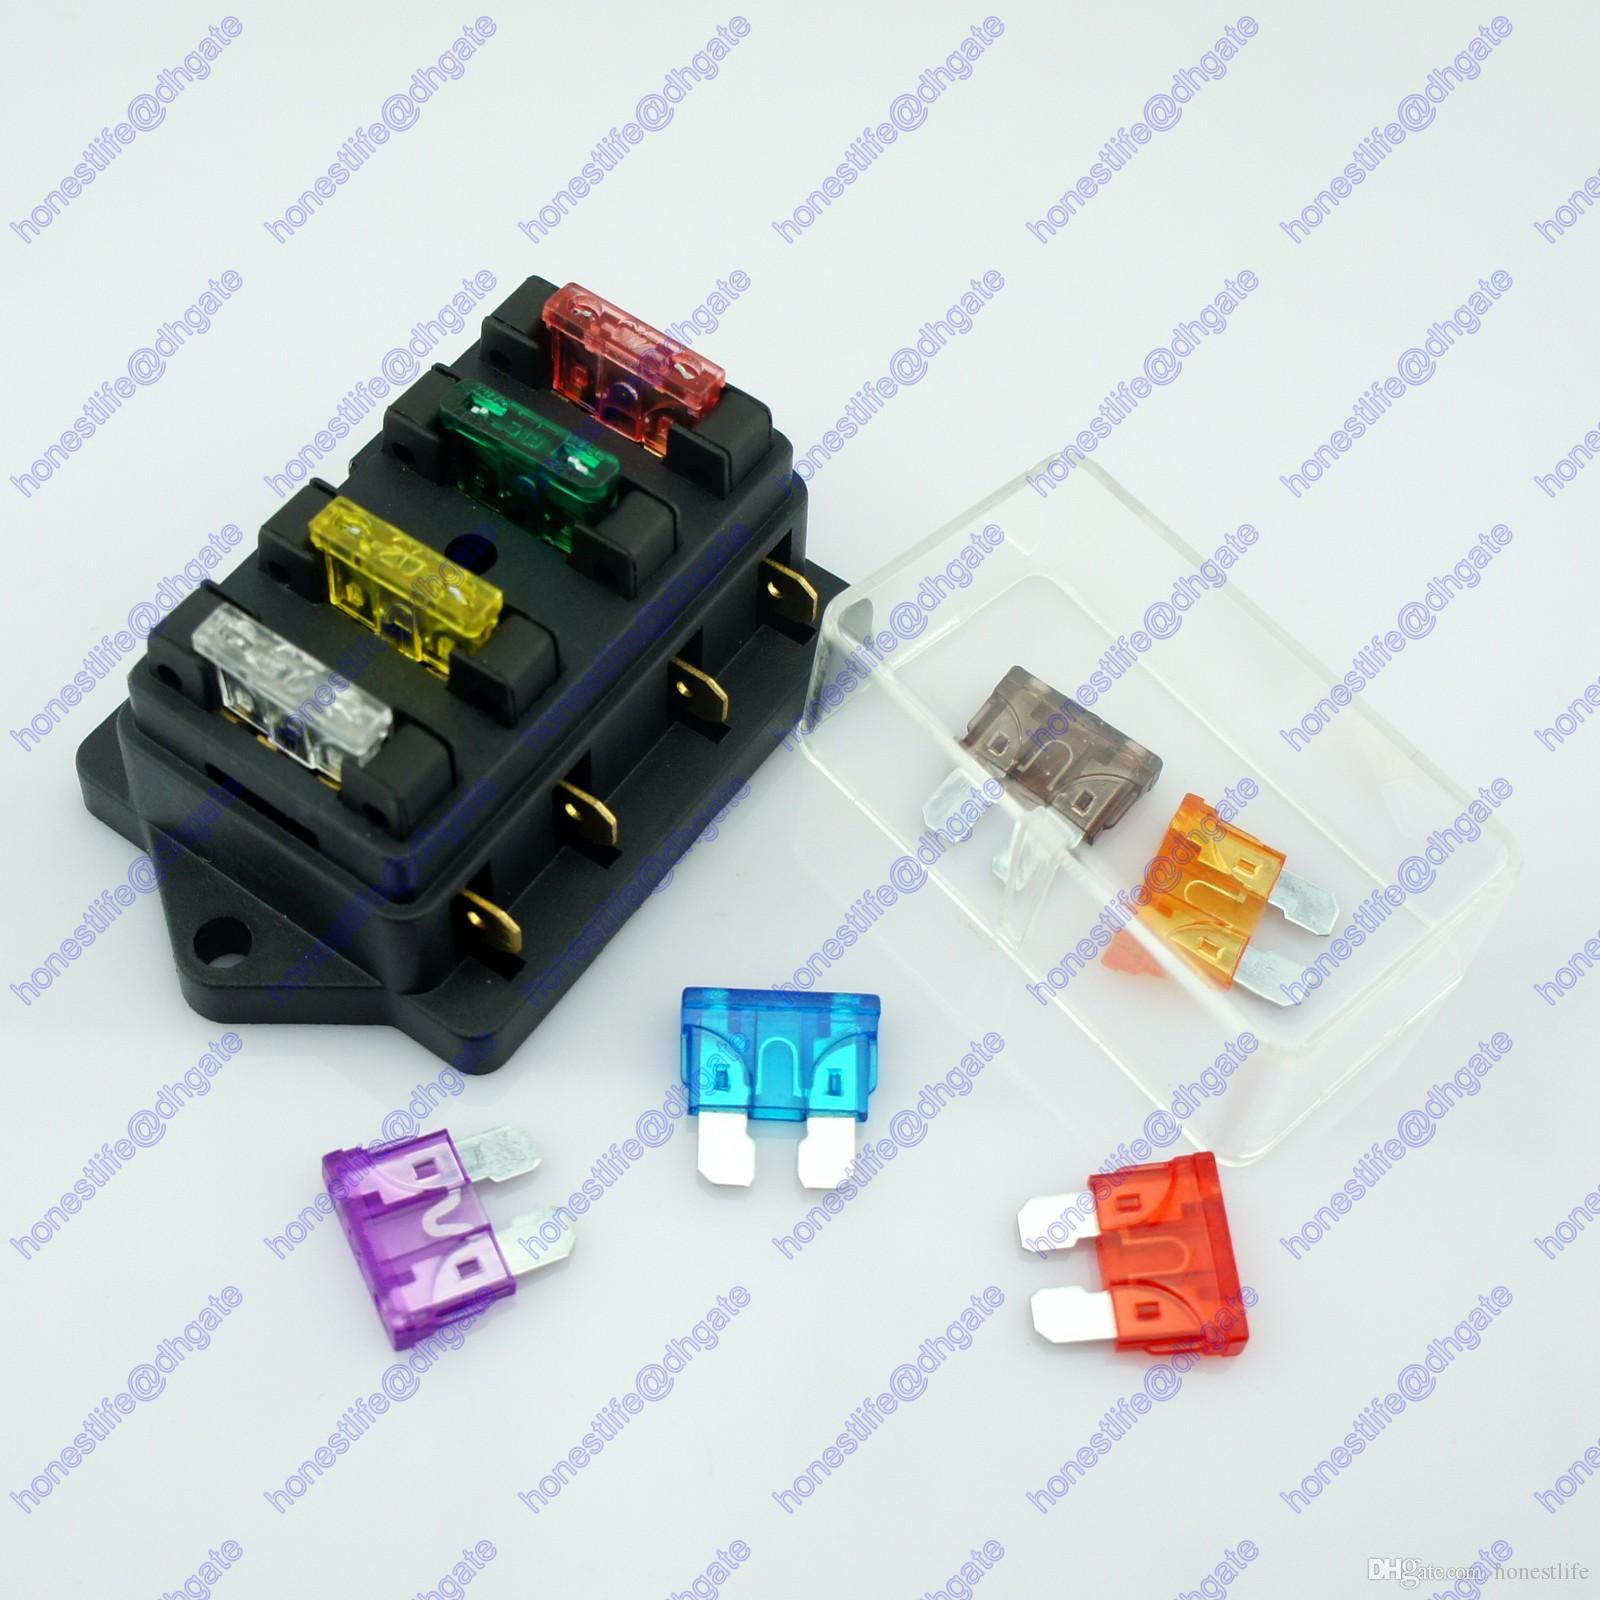 hight resolution of fuse box g3 boat manual e book fuse box g3 boat